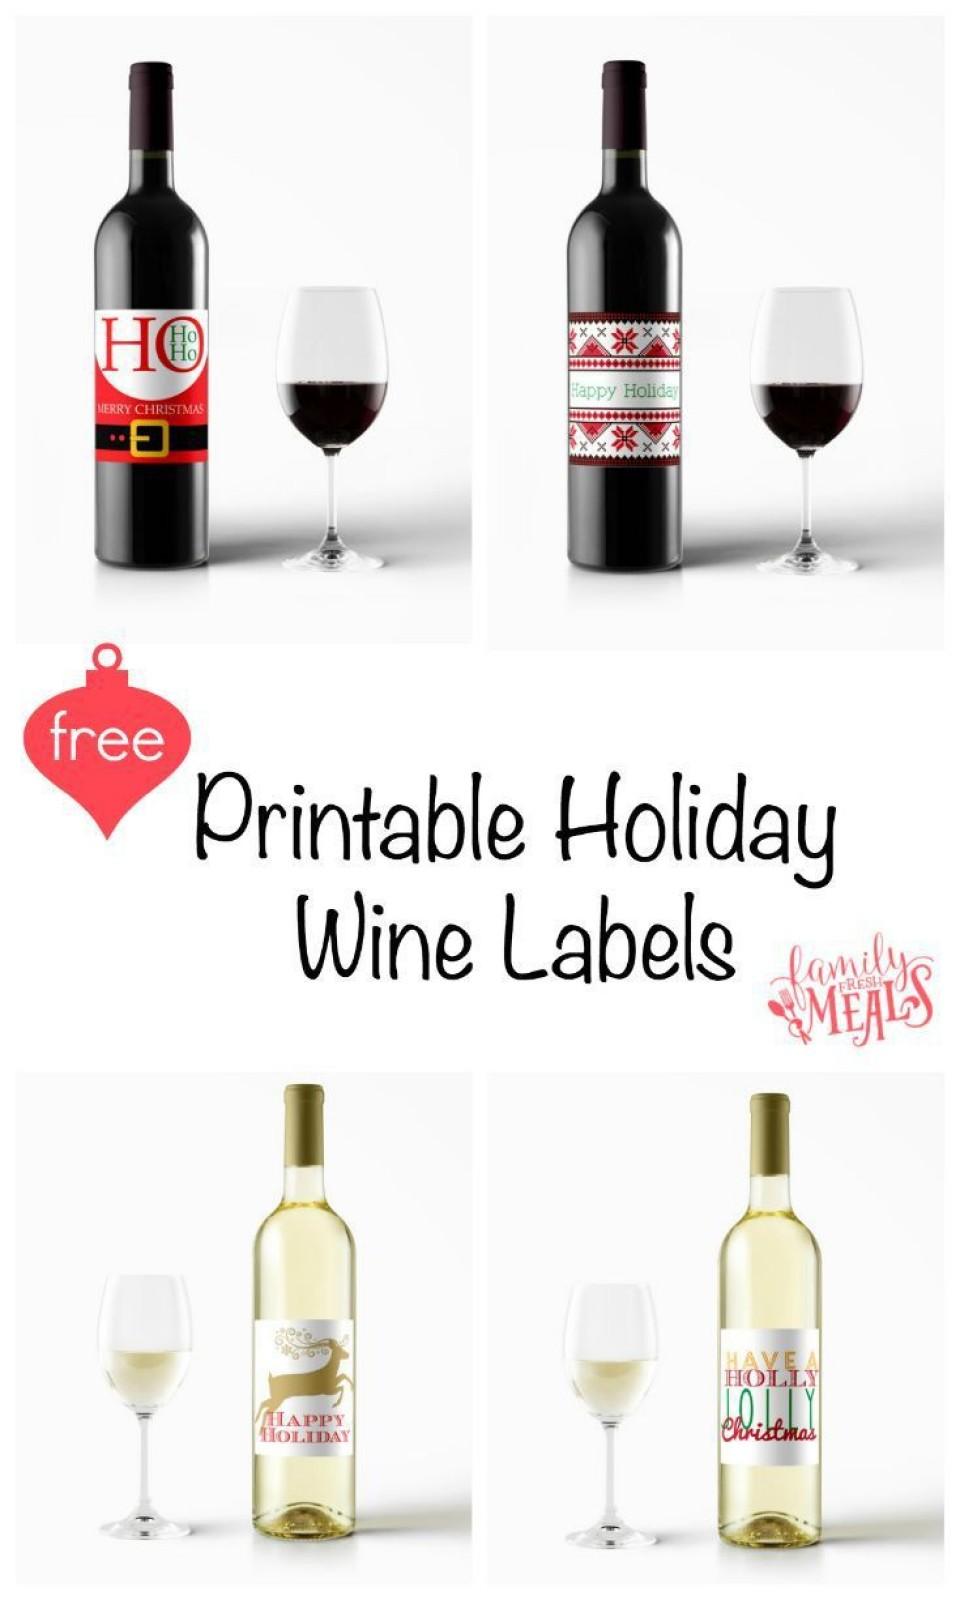 001 Singular Free Wine Label Template Design  Bottle Microsoft Word Online Psd960